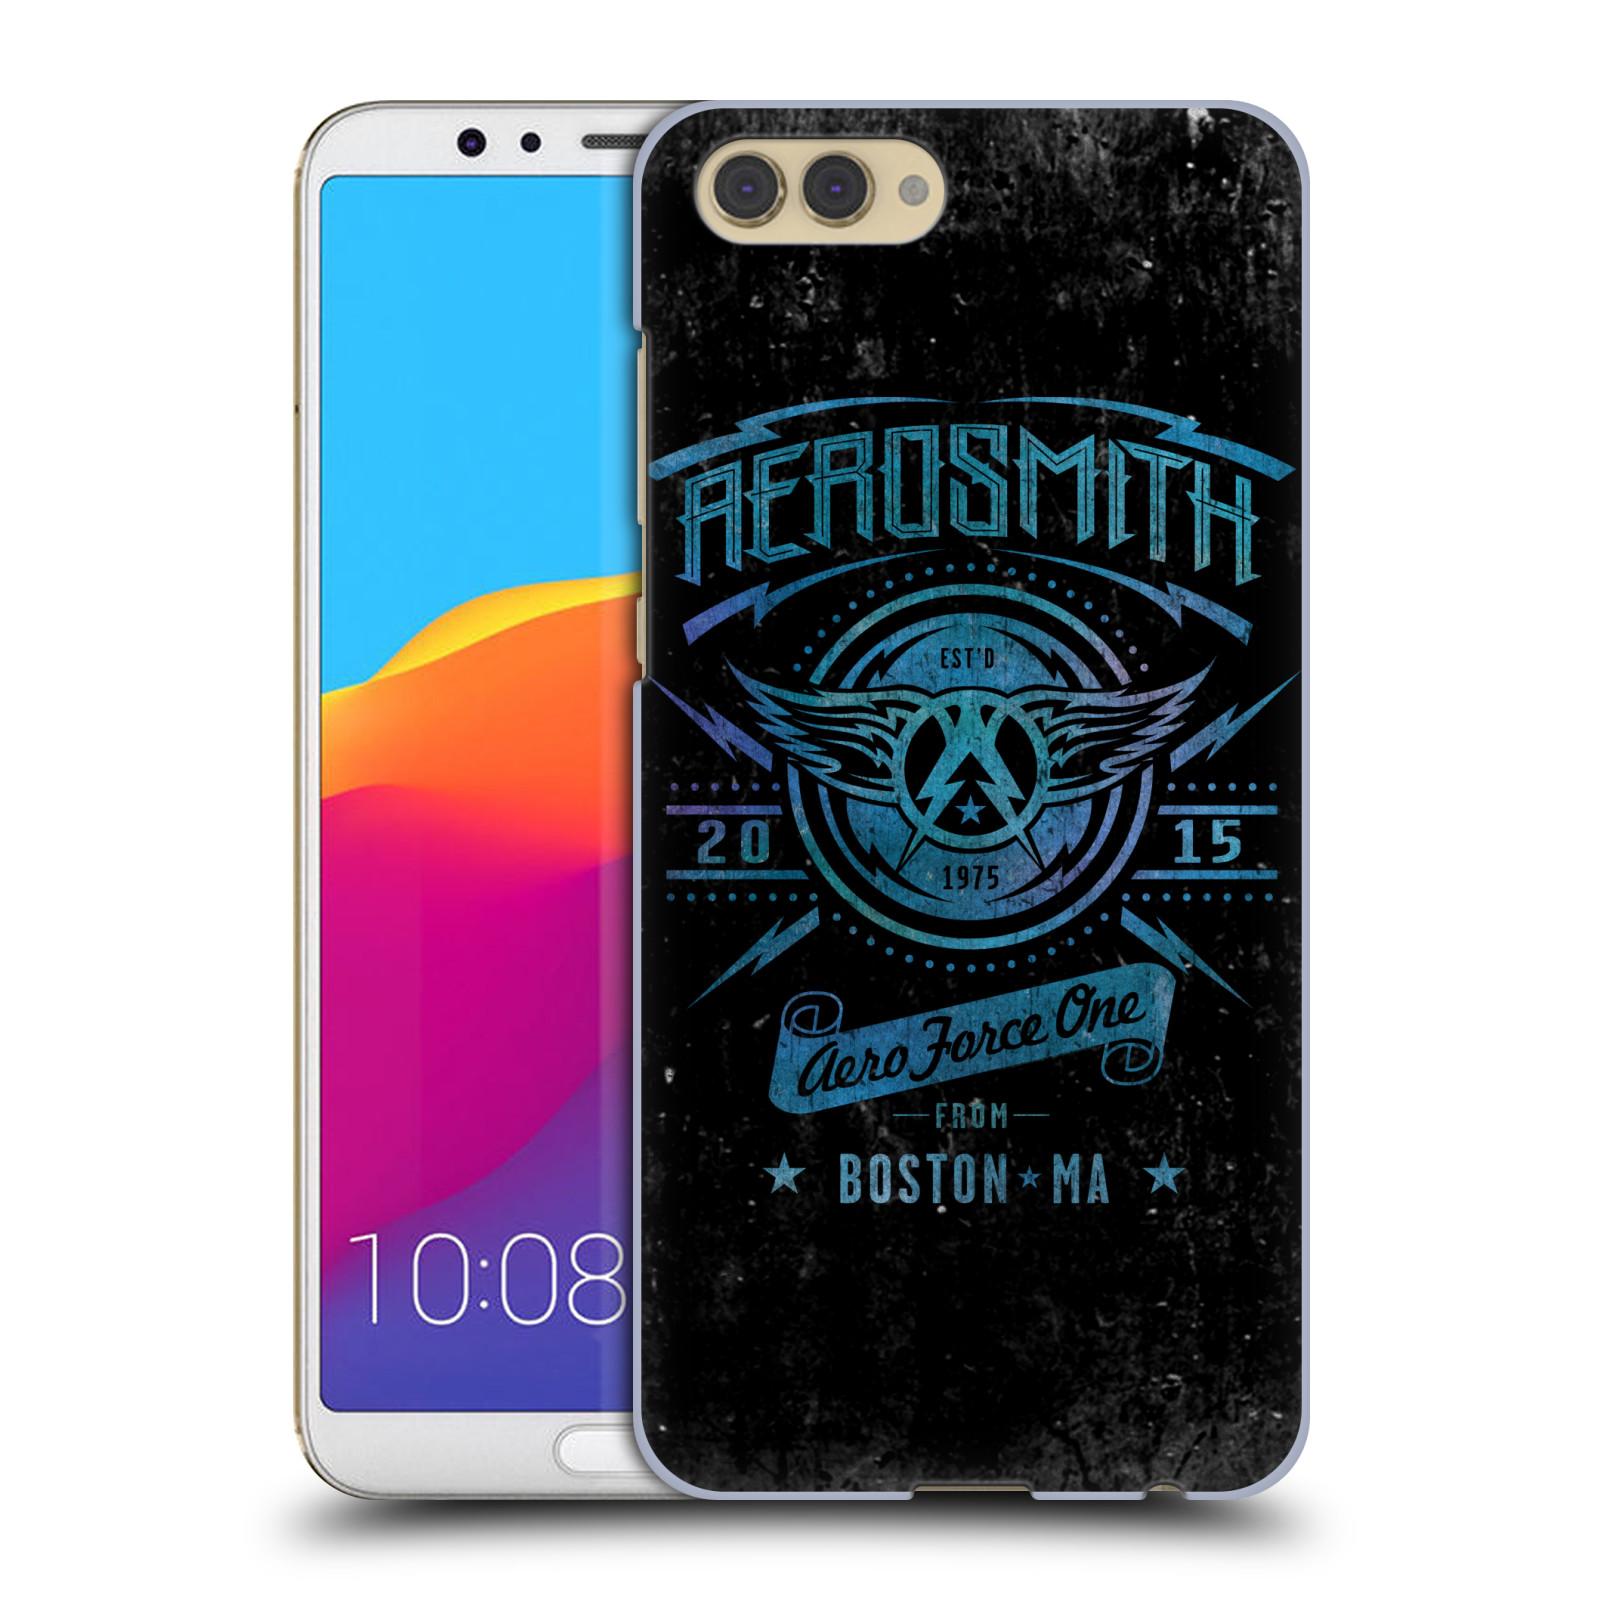 Plastové pouzdro na mobil Honor View 10 - Head Case - Aerosmith - Aero Force One